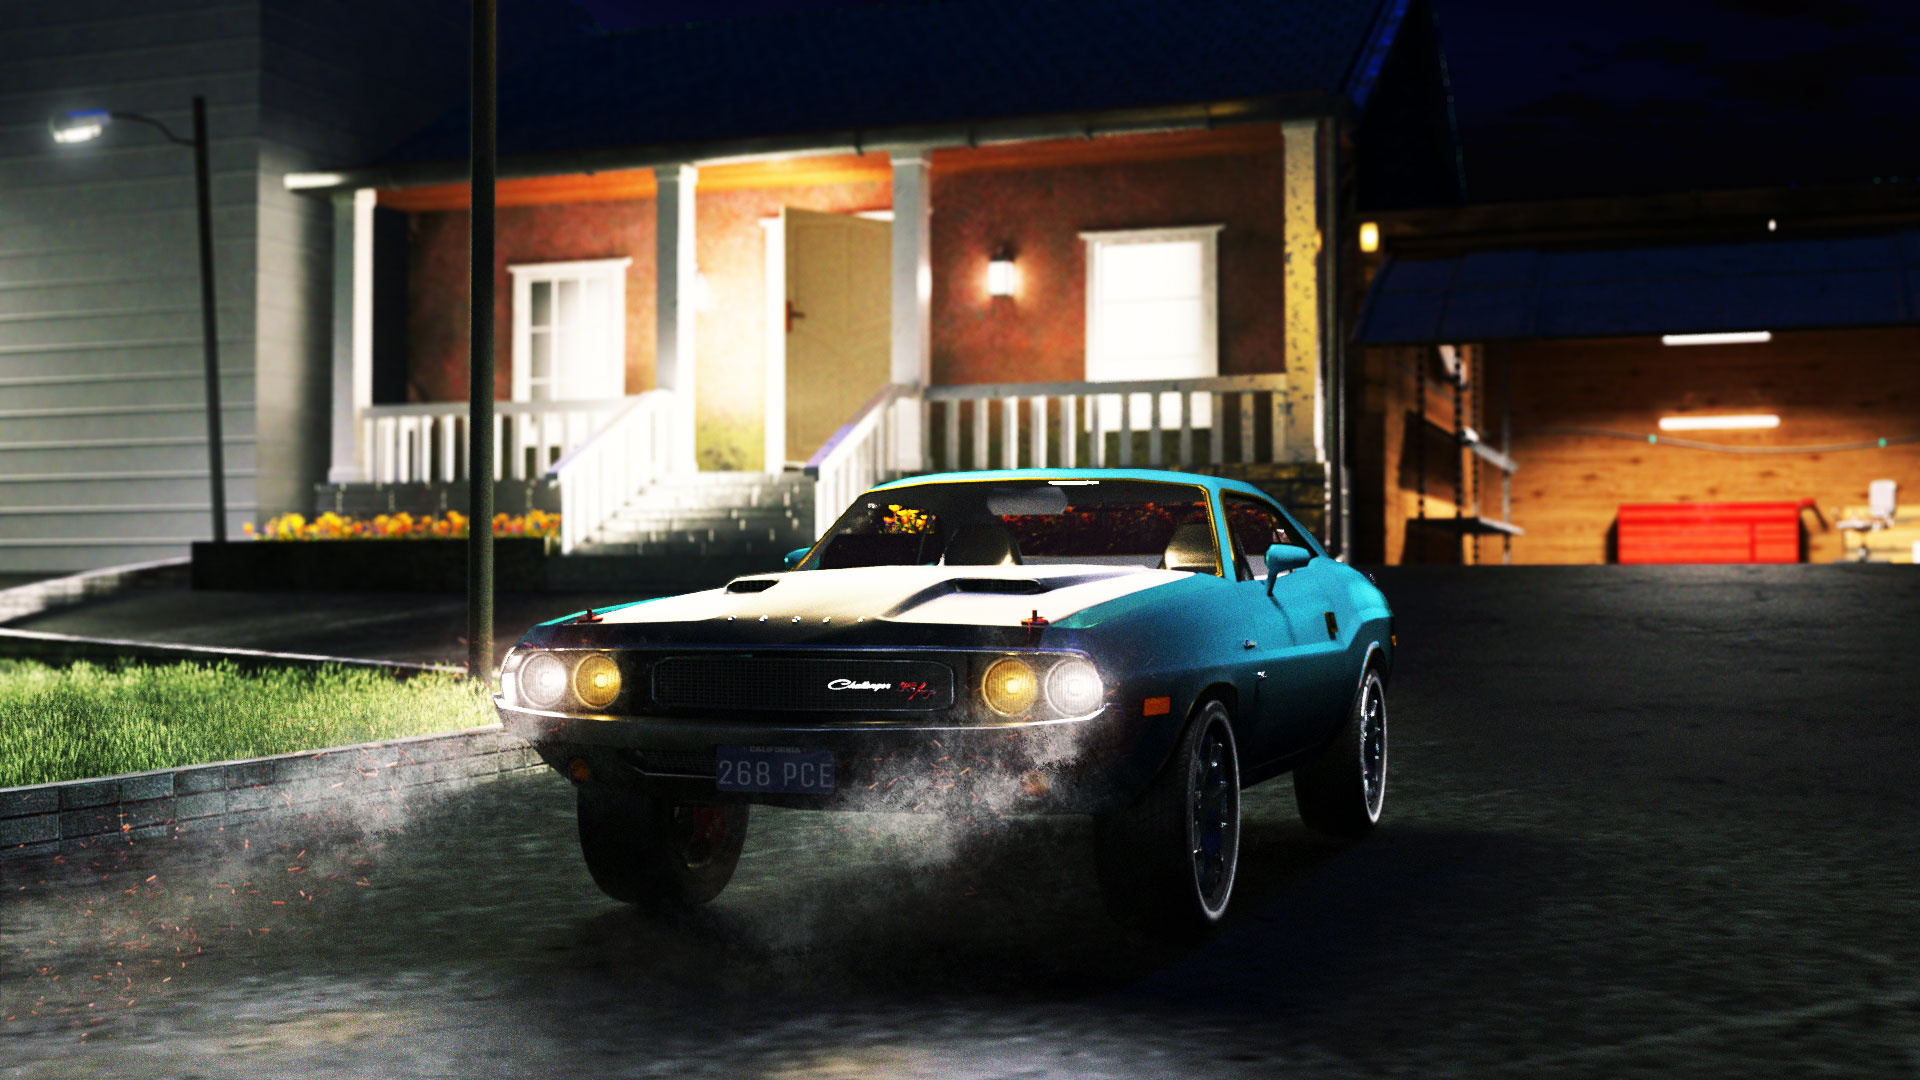 Car Render Challenge 2019 - Dodge Challenger 1970